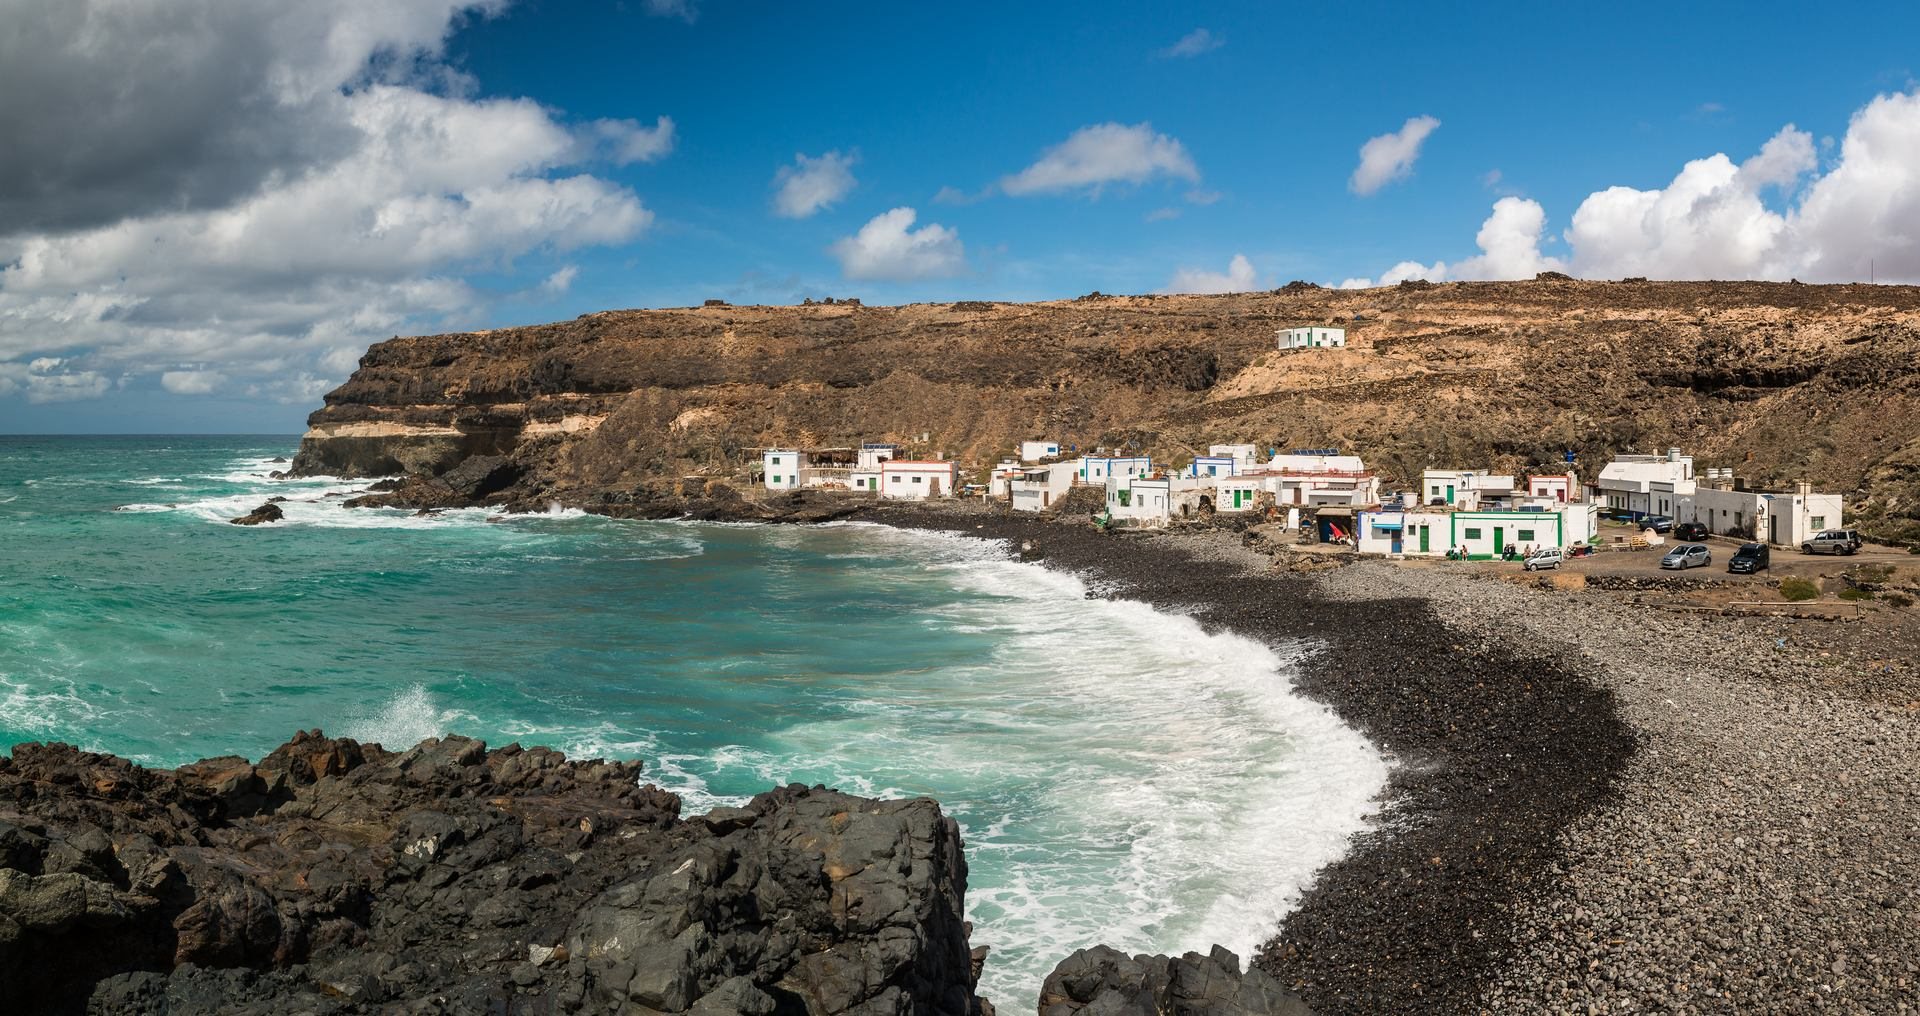 stories/2019-08-17-fuerteventura-the-paradise-island